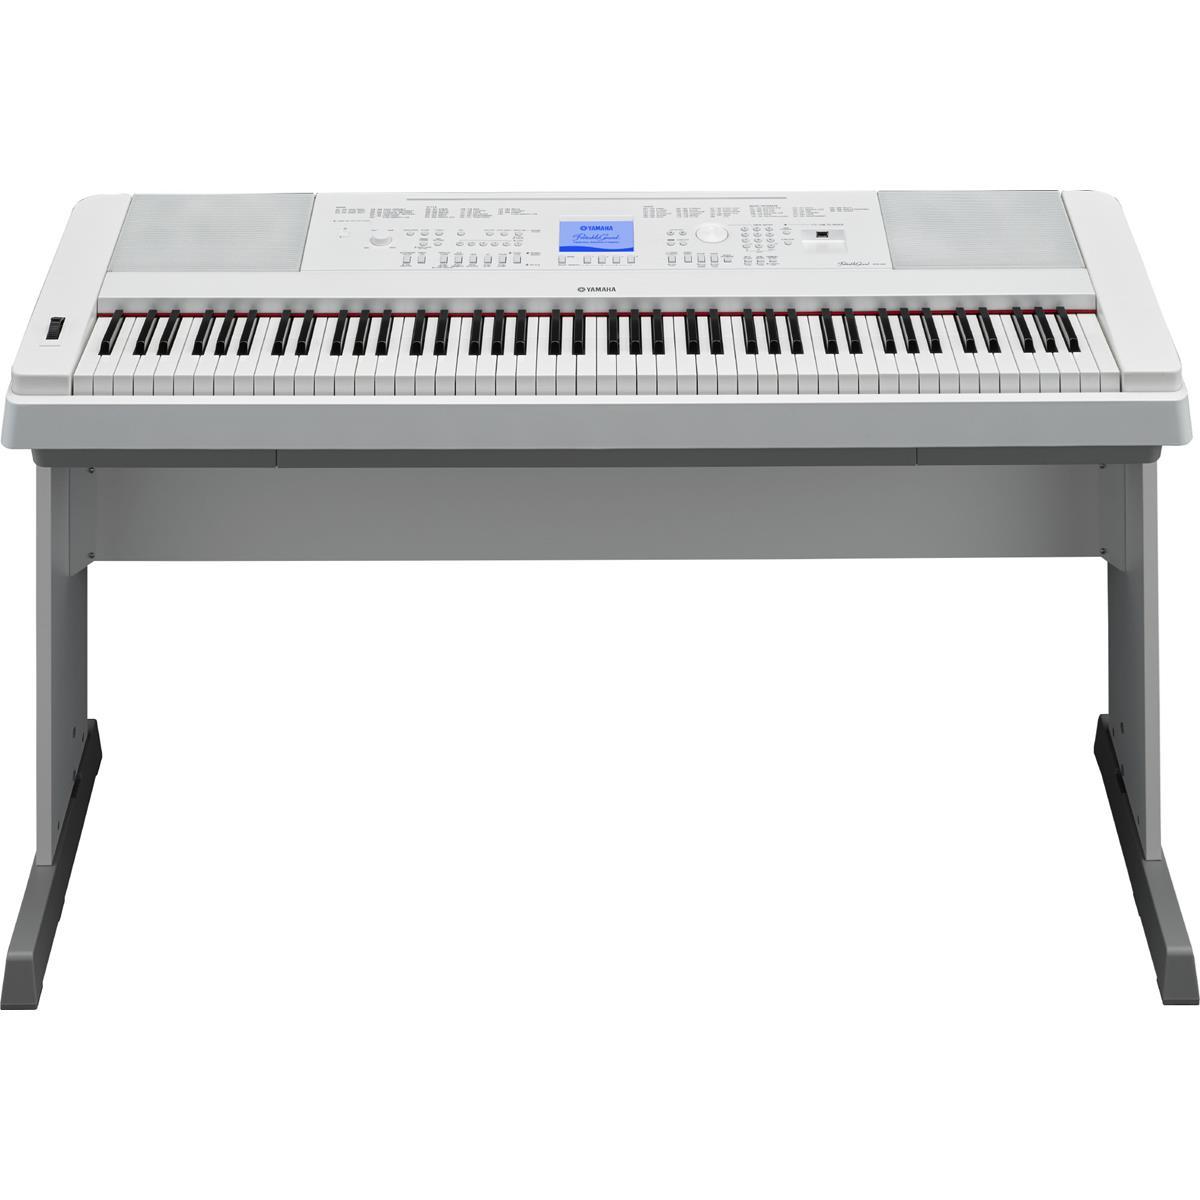 YAMAHA DGX 660 WH - DIGITAL PIANO WHITE - Tastiere Pianoforti Digitali